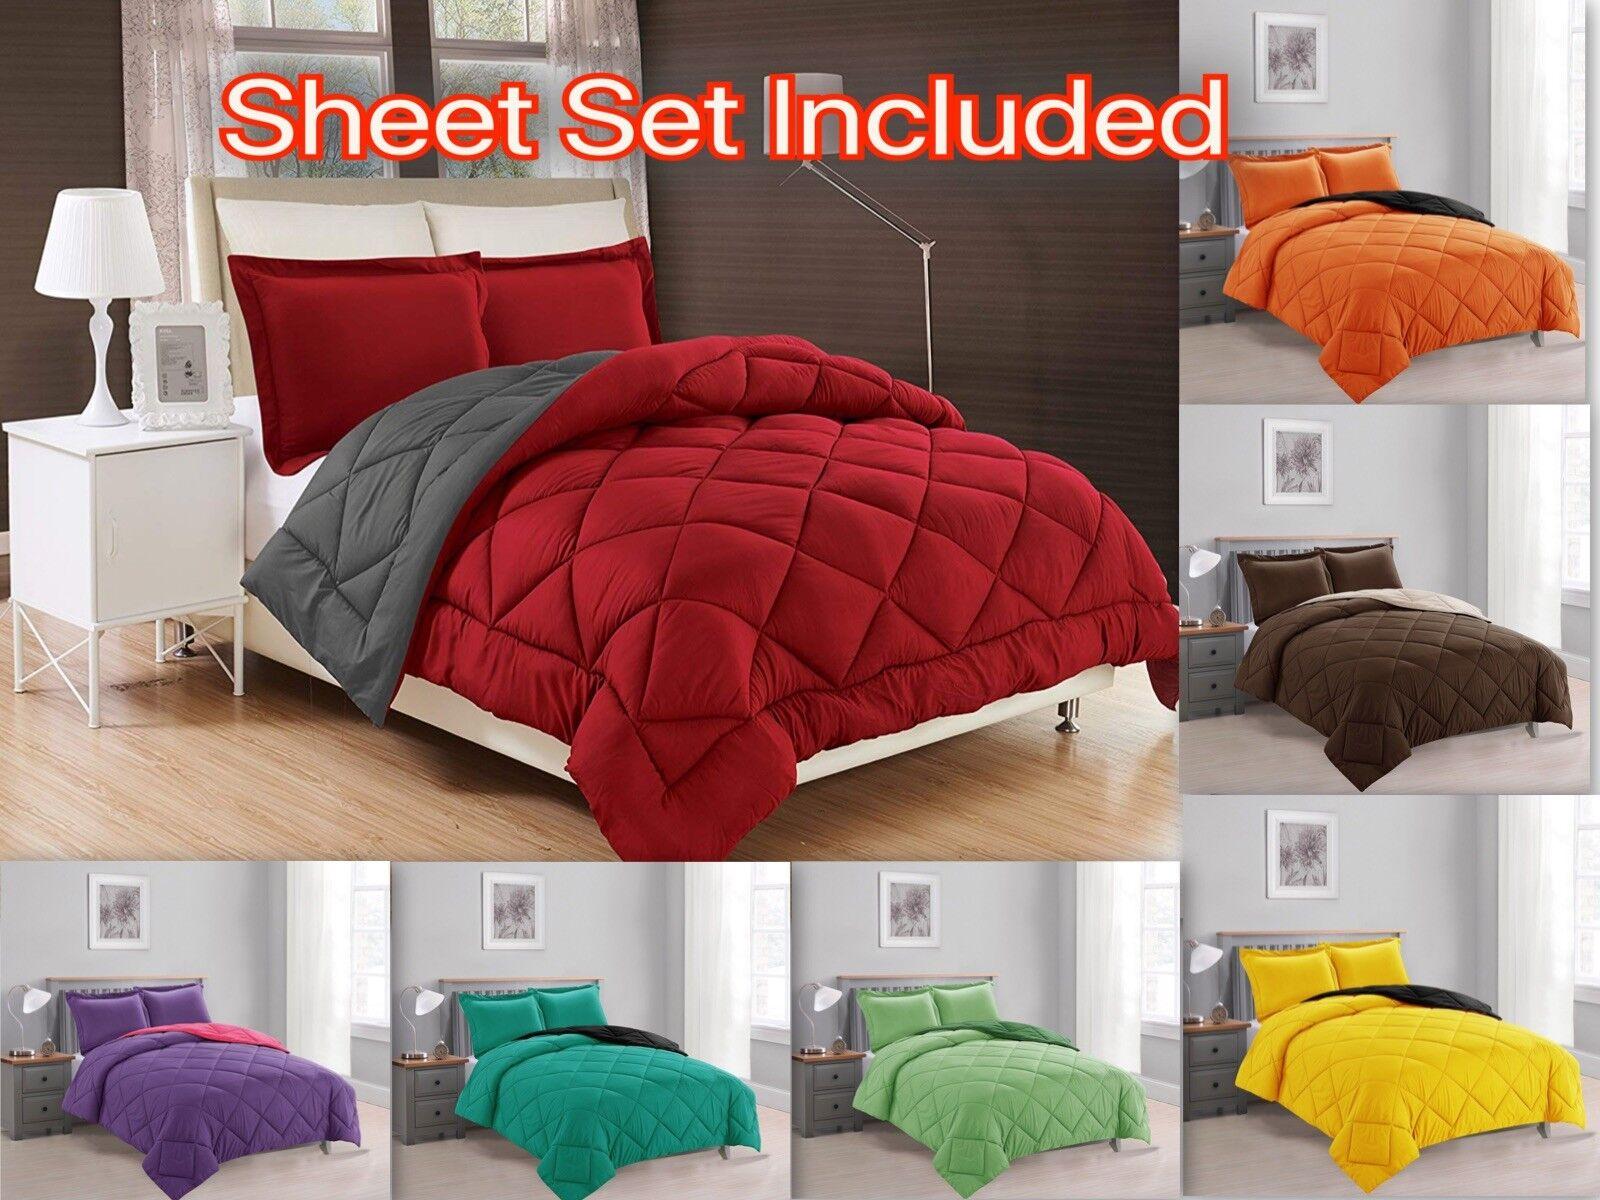 Black And White Bedding Set Twin Size Striped Mens Comforter Sheets Bed Bag For Sale Online Ebay